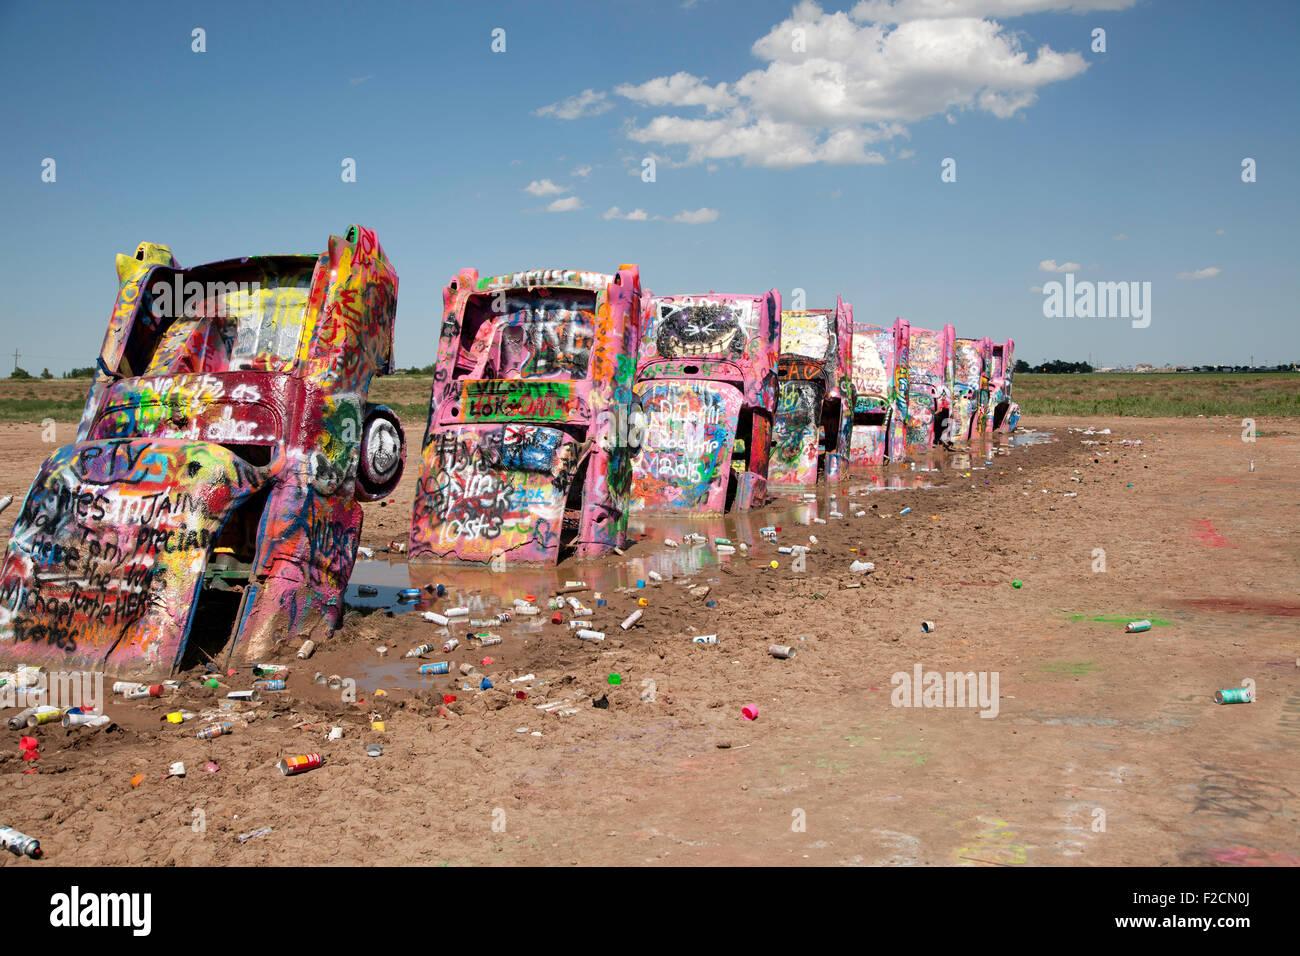 Graffiti cover cars at cadillac ranch in amarillo texas on july 13 2015